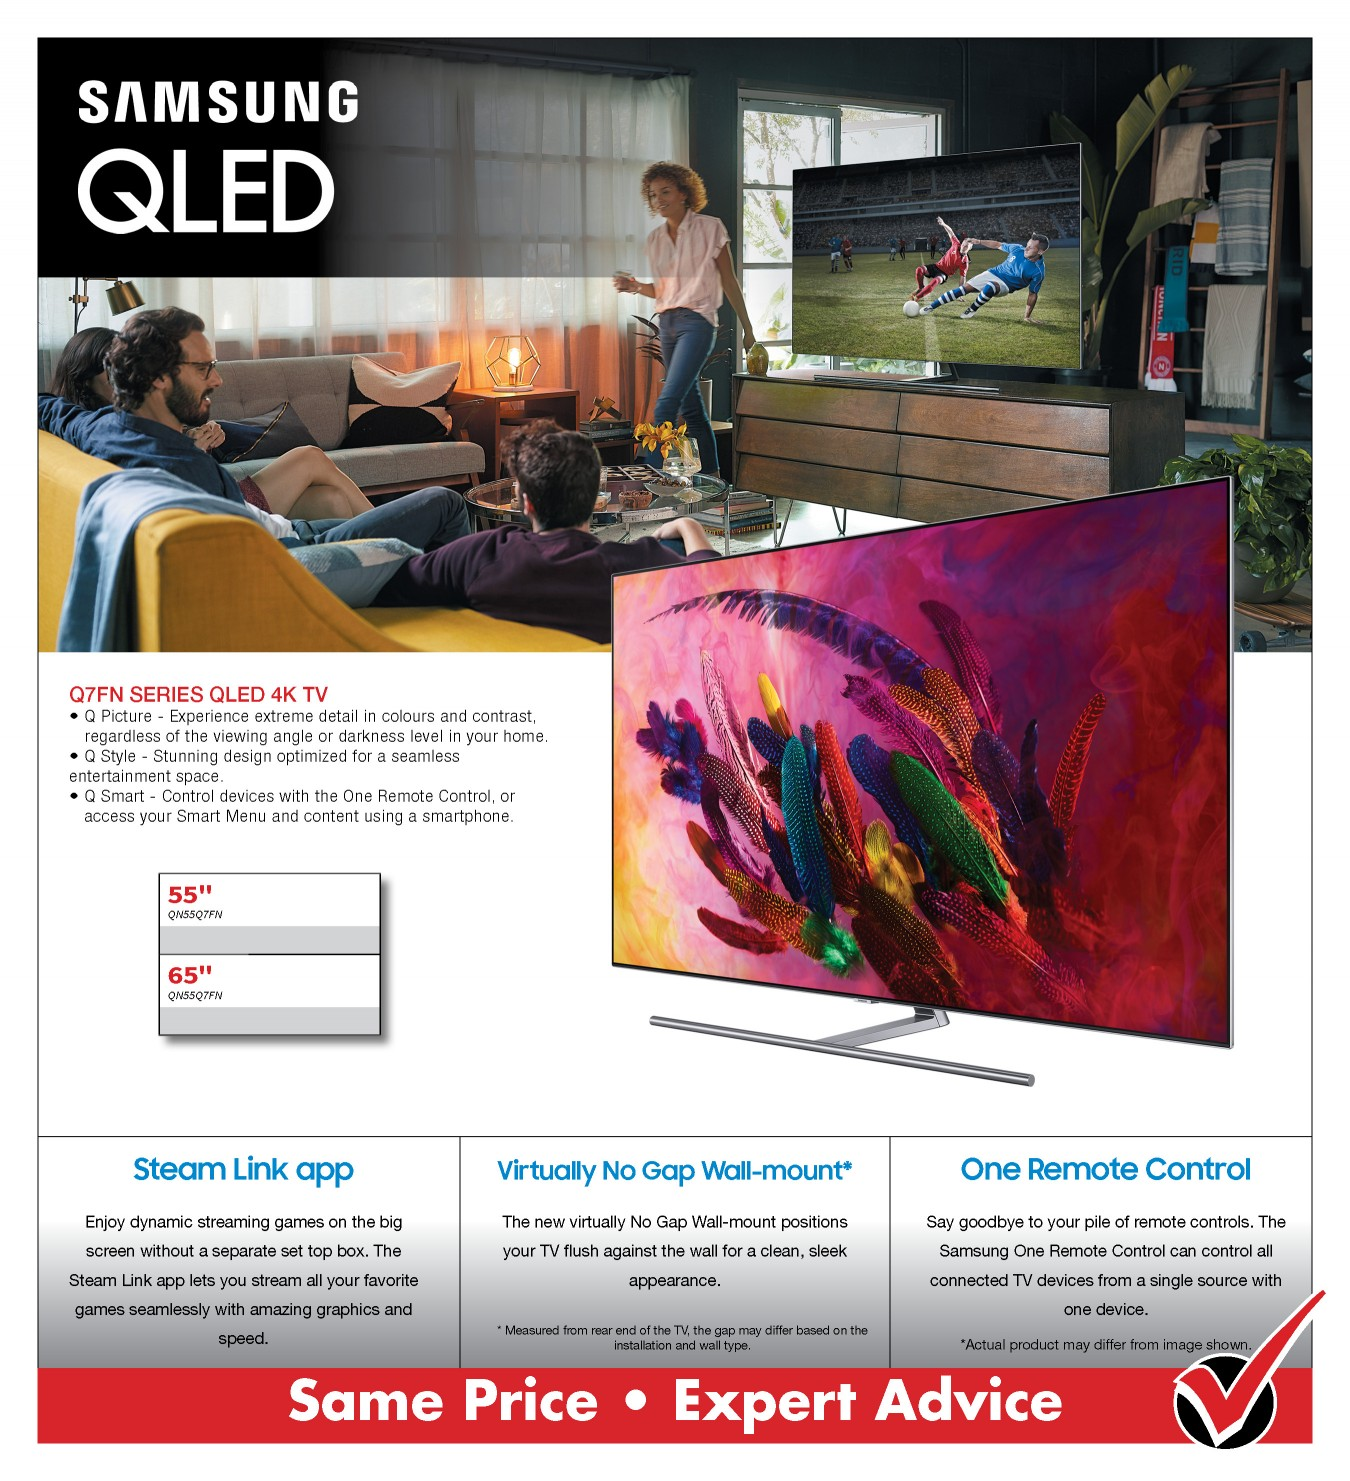 Samsung Q7FN QLED